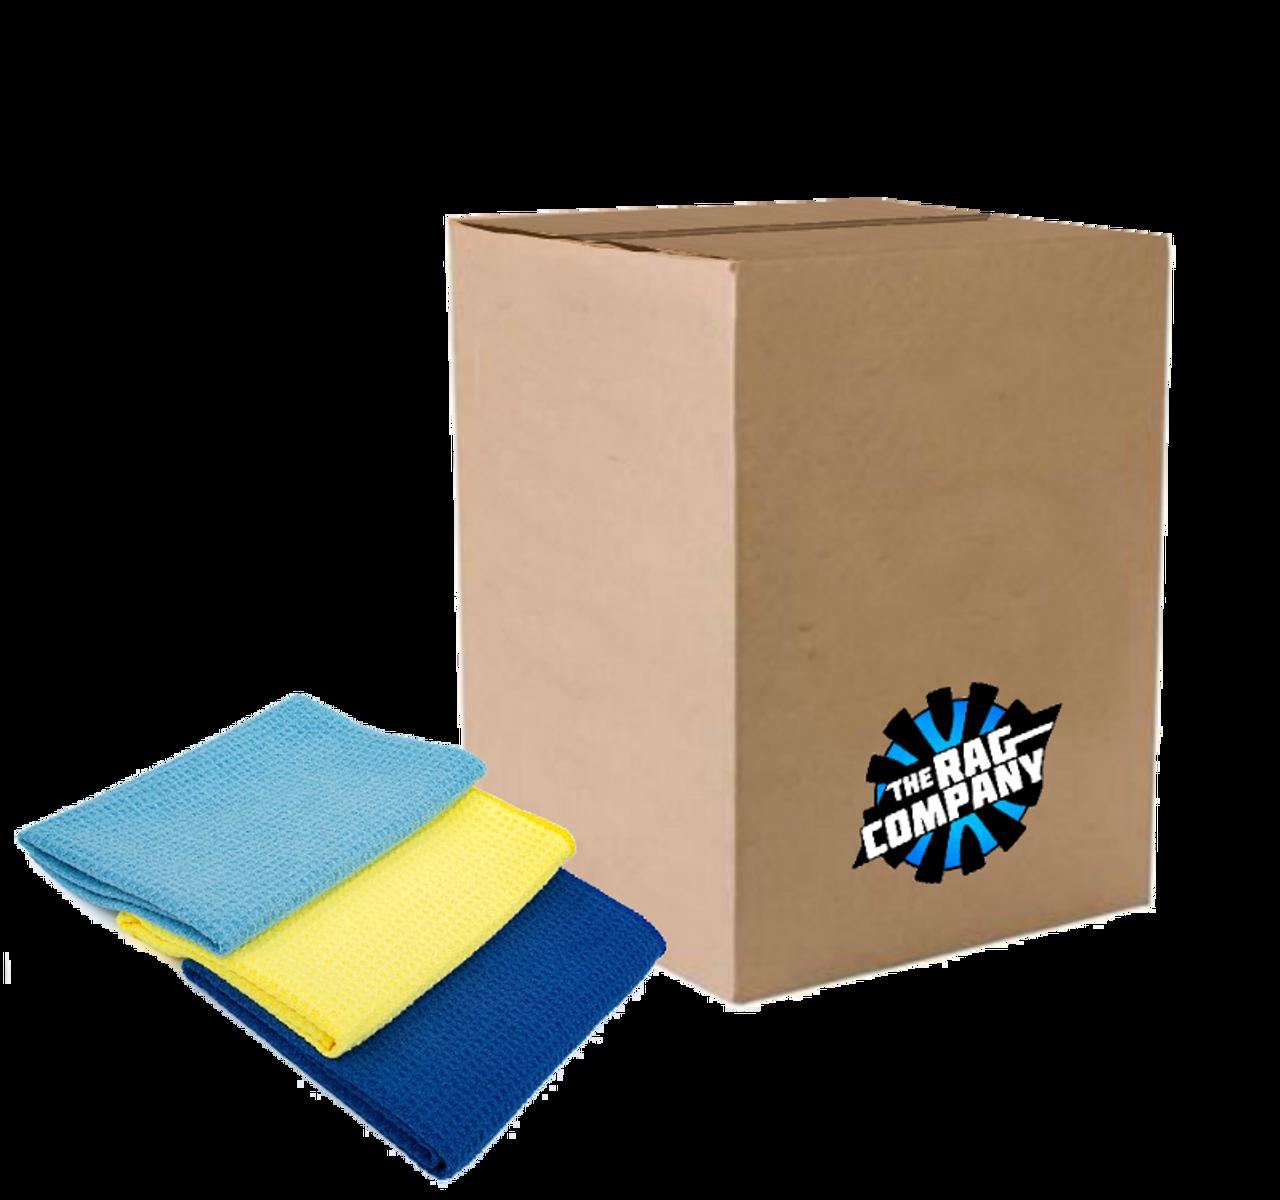 24 16x16 Premium Waffle Weave Towels Cleaning//Detailing Towels 370GSM Orange